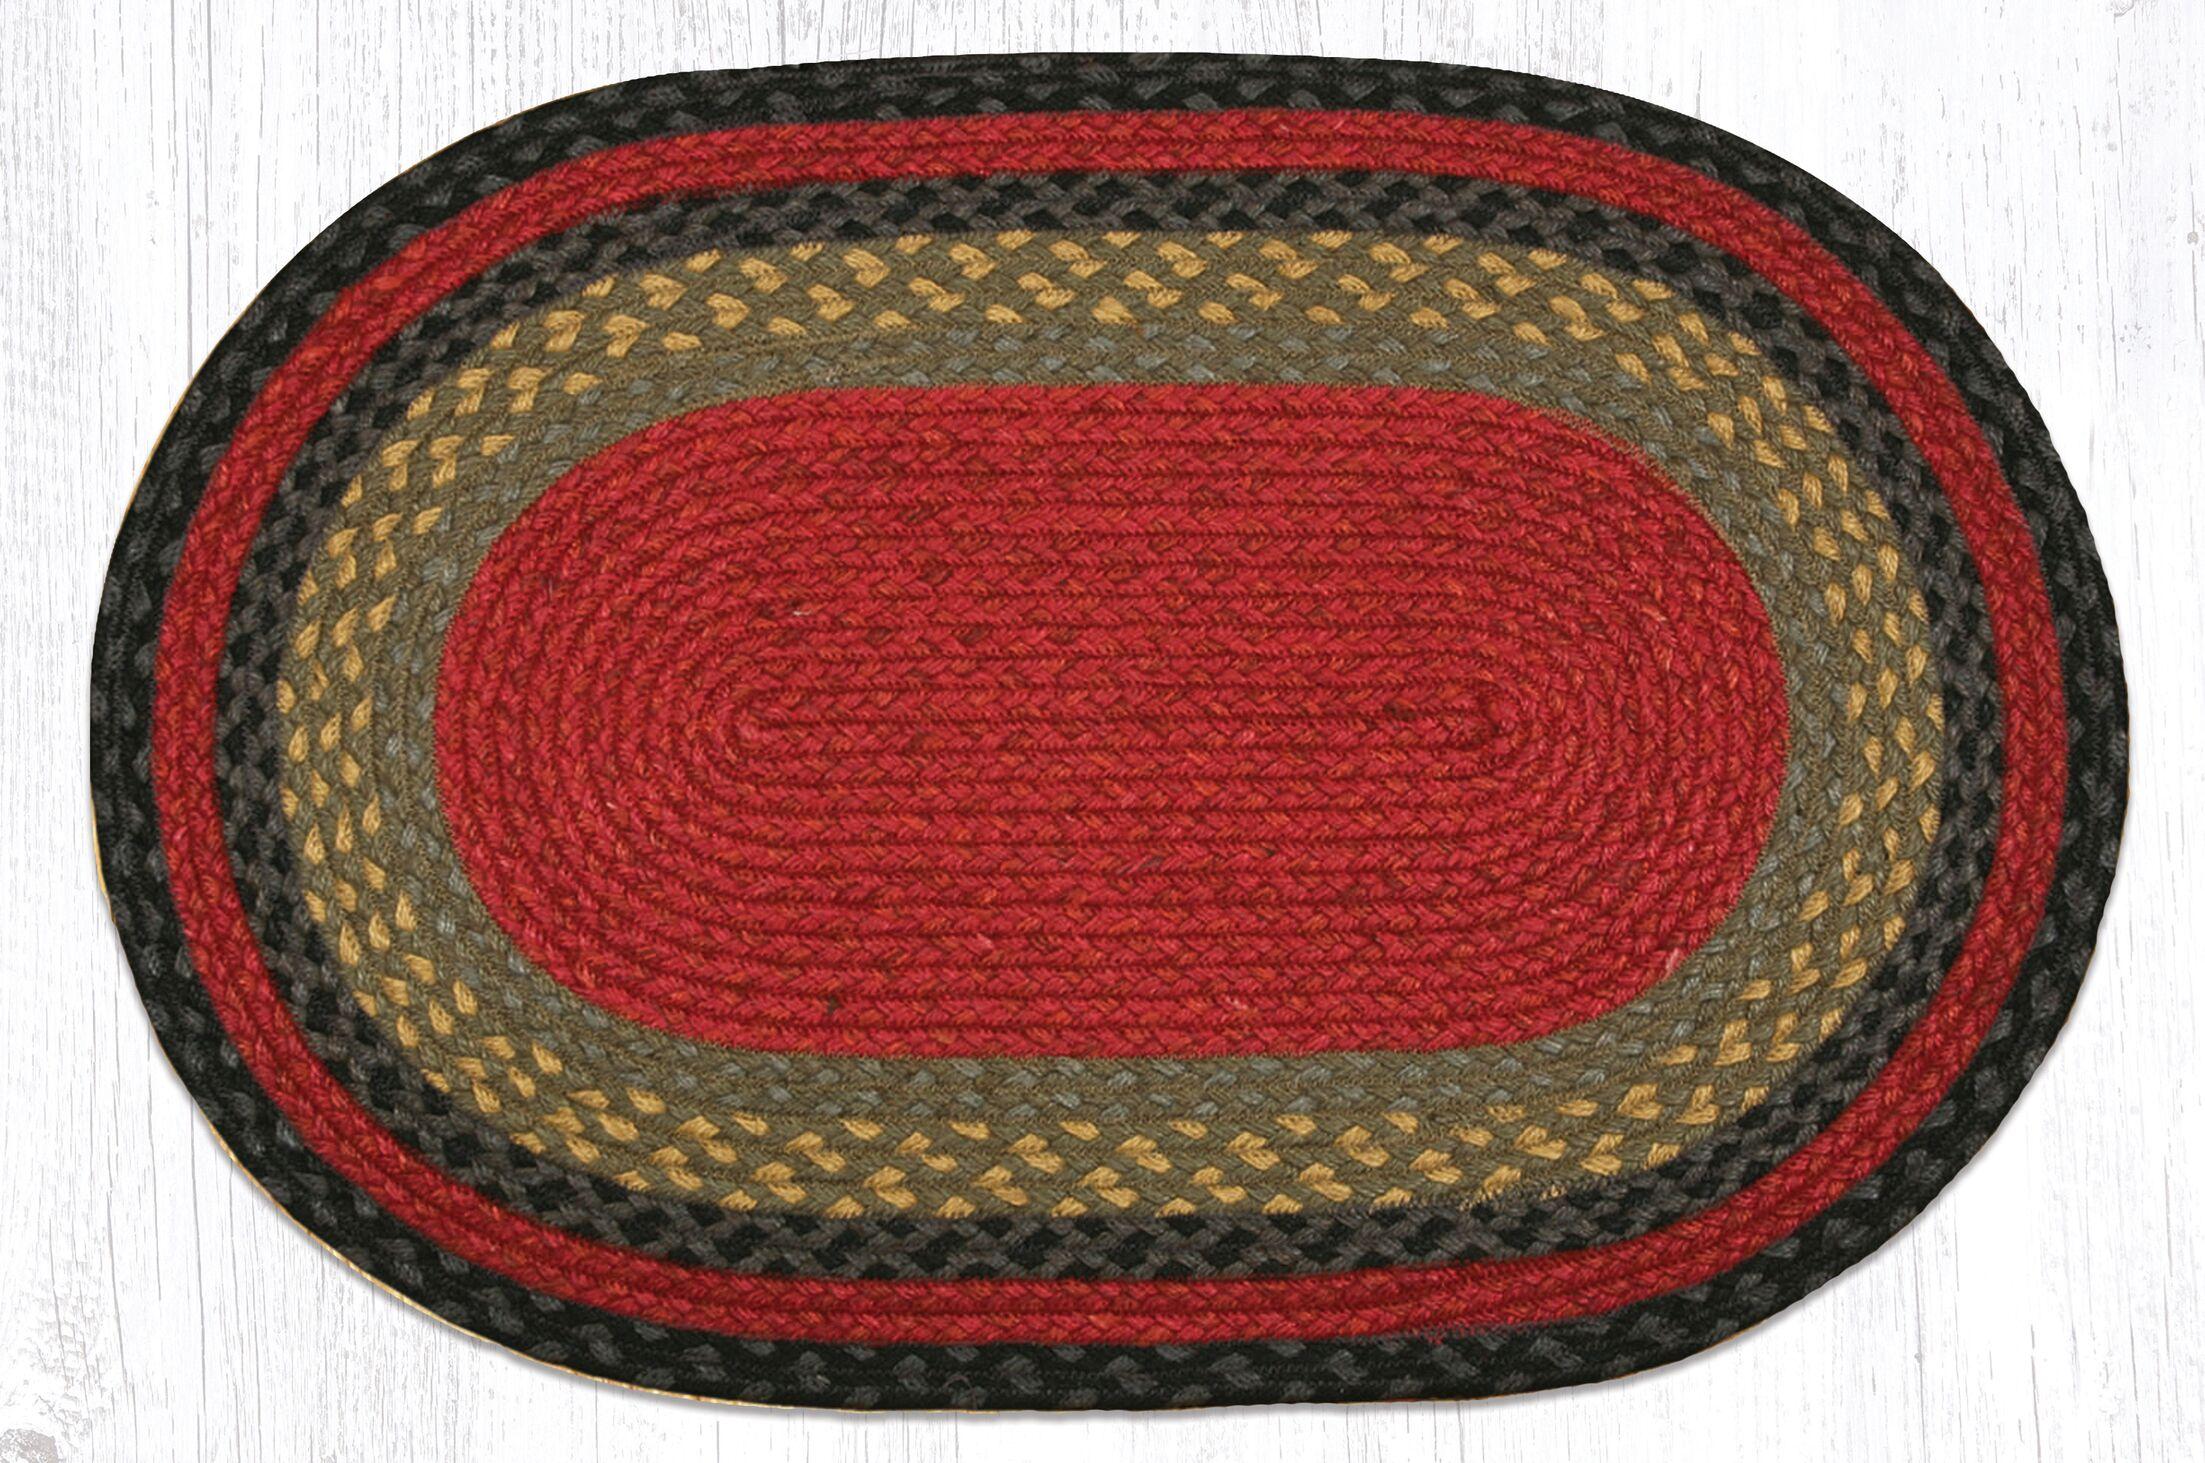 Burgundy/Olive/Charcoal Braided Area Rug Rug Size: Oval 1'8